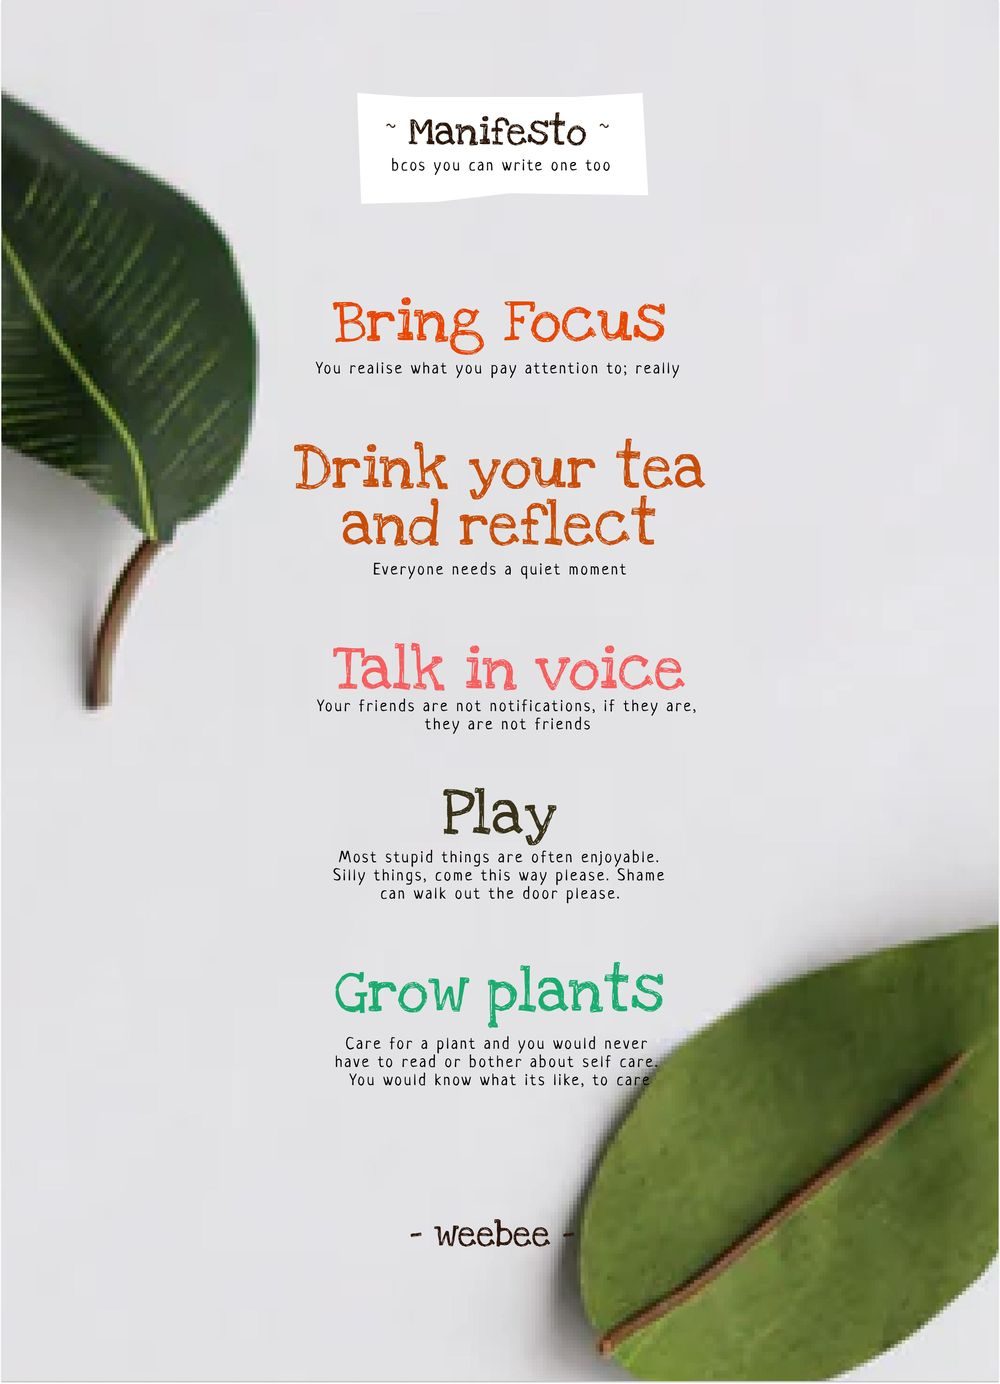 Manifesto by Varun - image 1 - student project